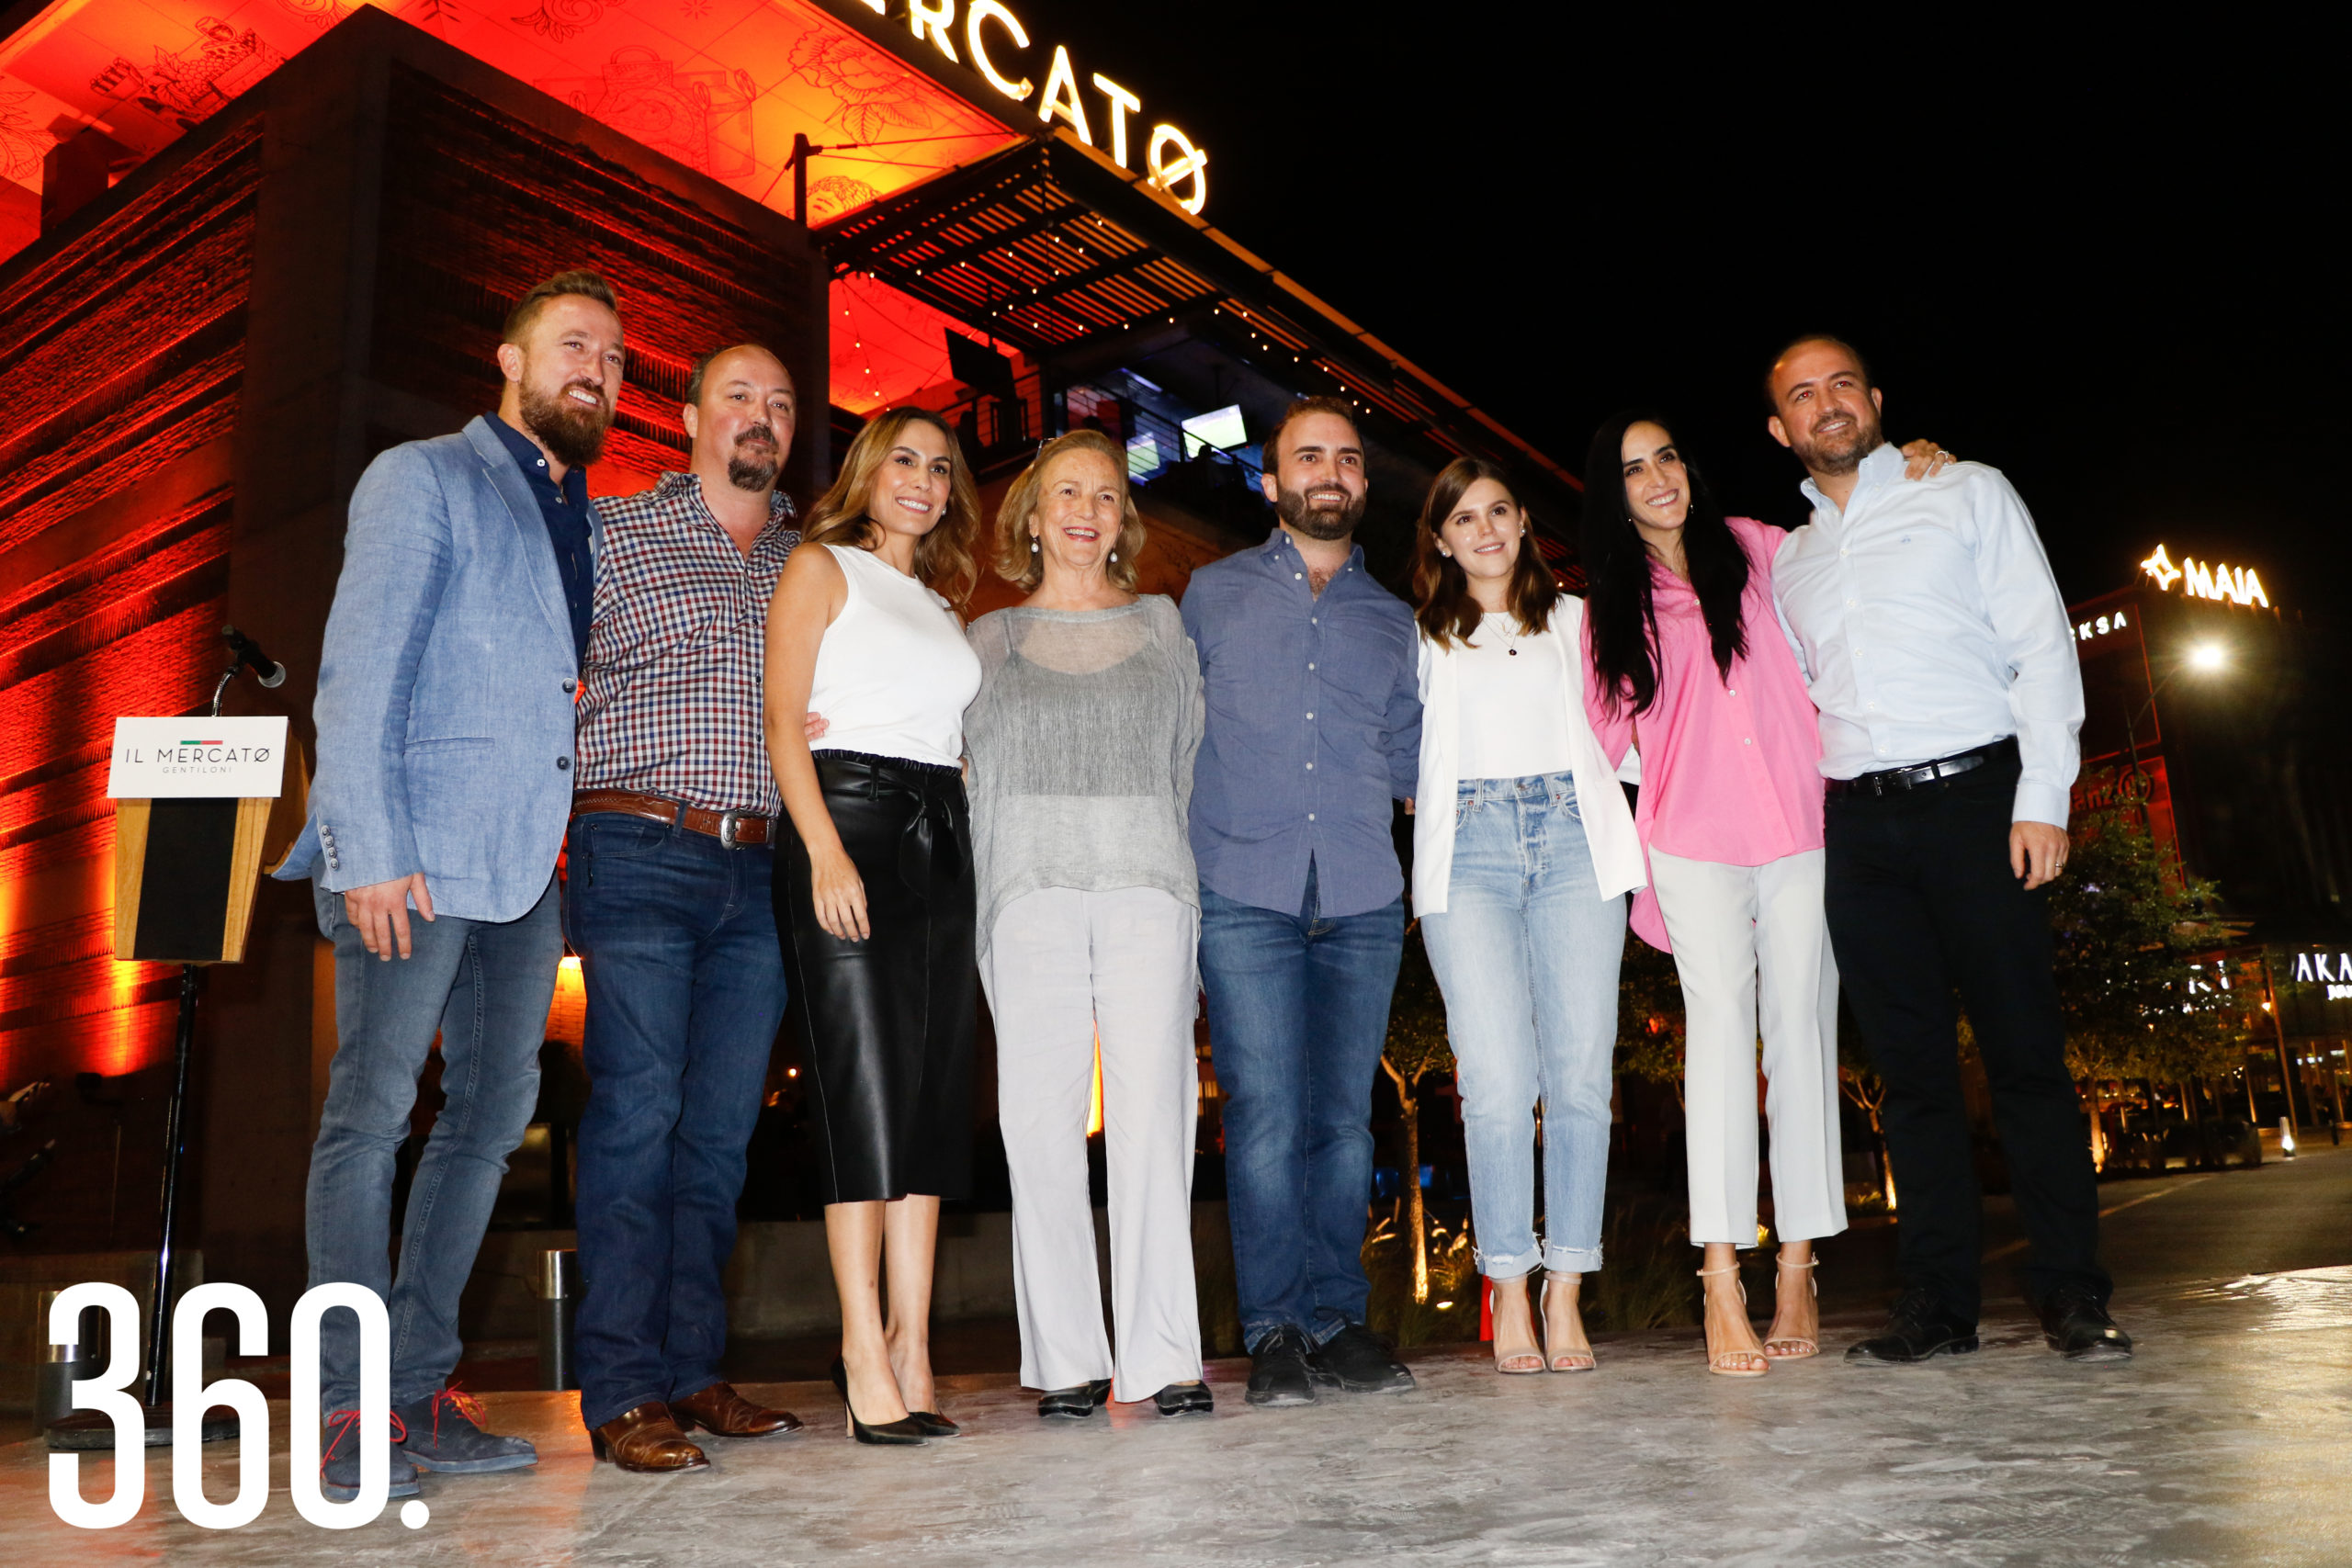 Fabio Gentiloni, Lito Gentiloni, Gaby Castañeda, Beatriz Arizpe, Pedro Gentiloni, Bárbara Cárdenas, Maru de la Peña y Blas Gentiloni.